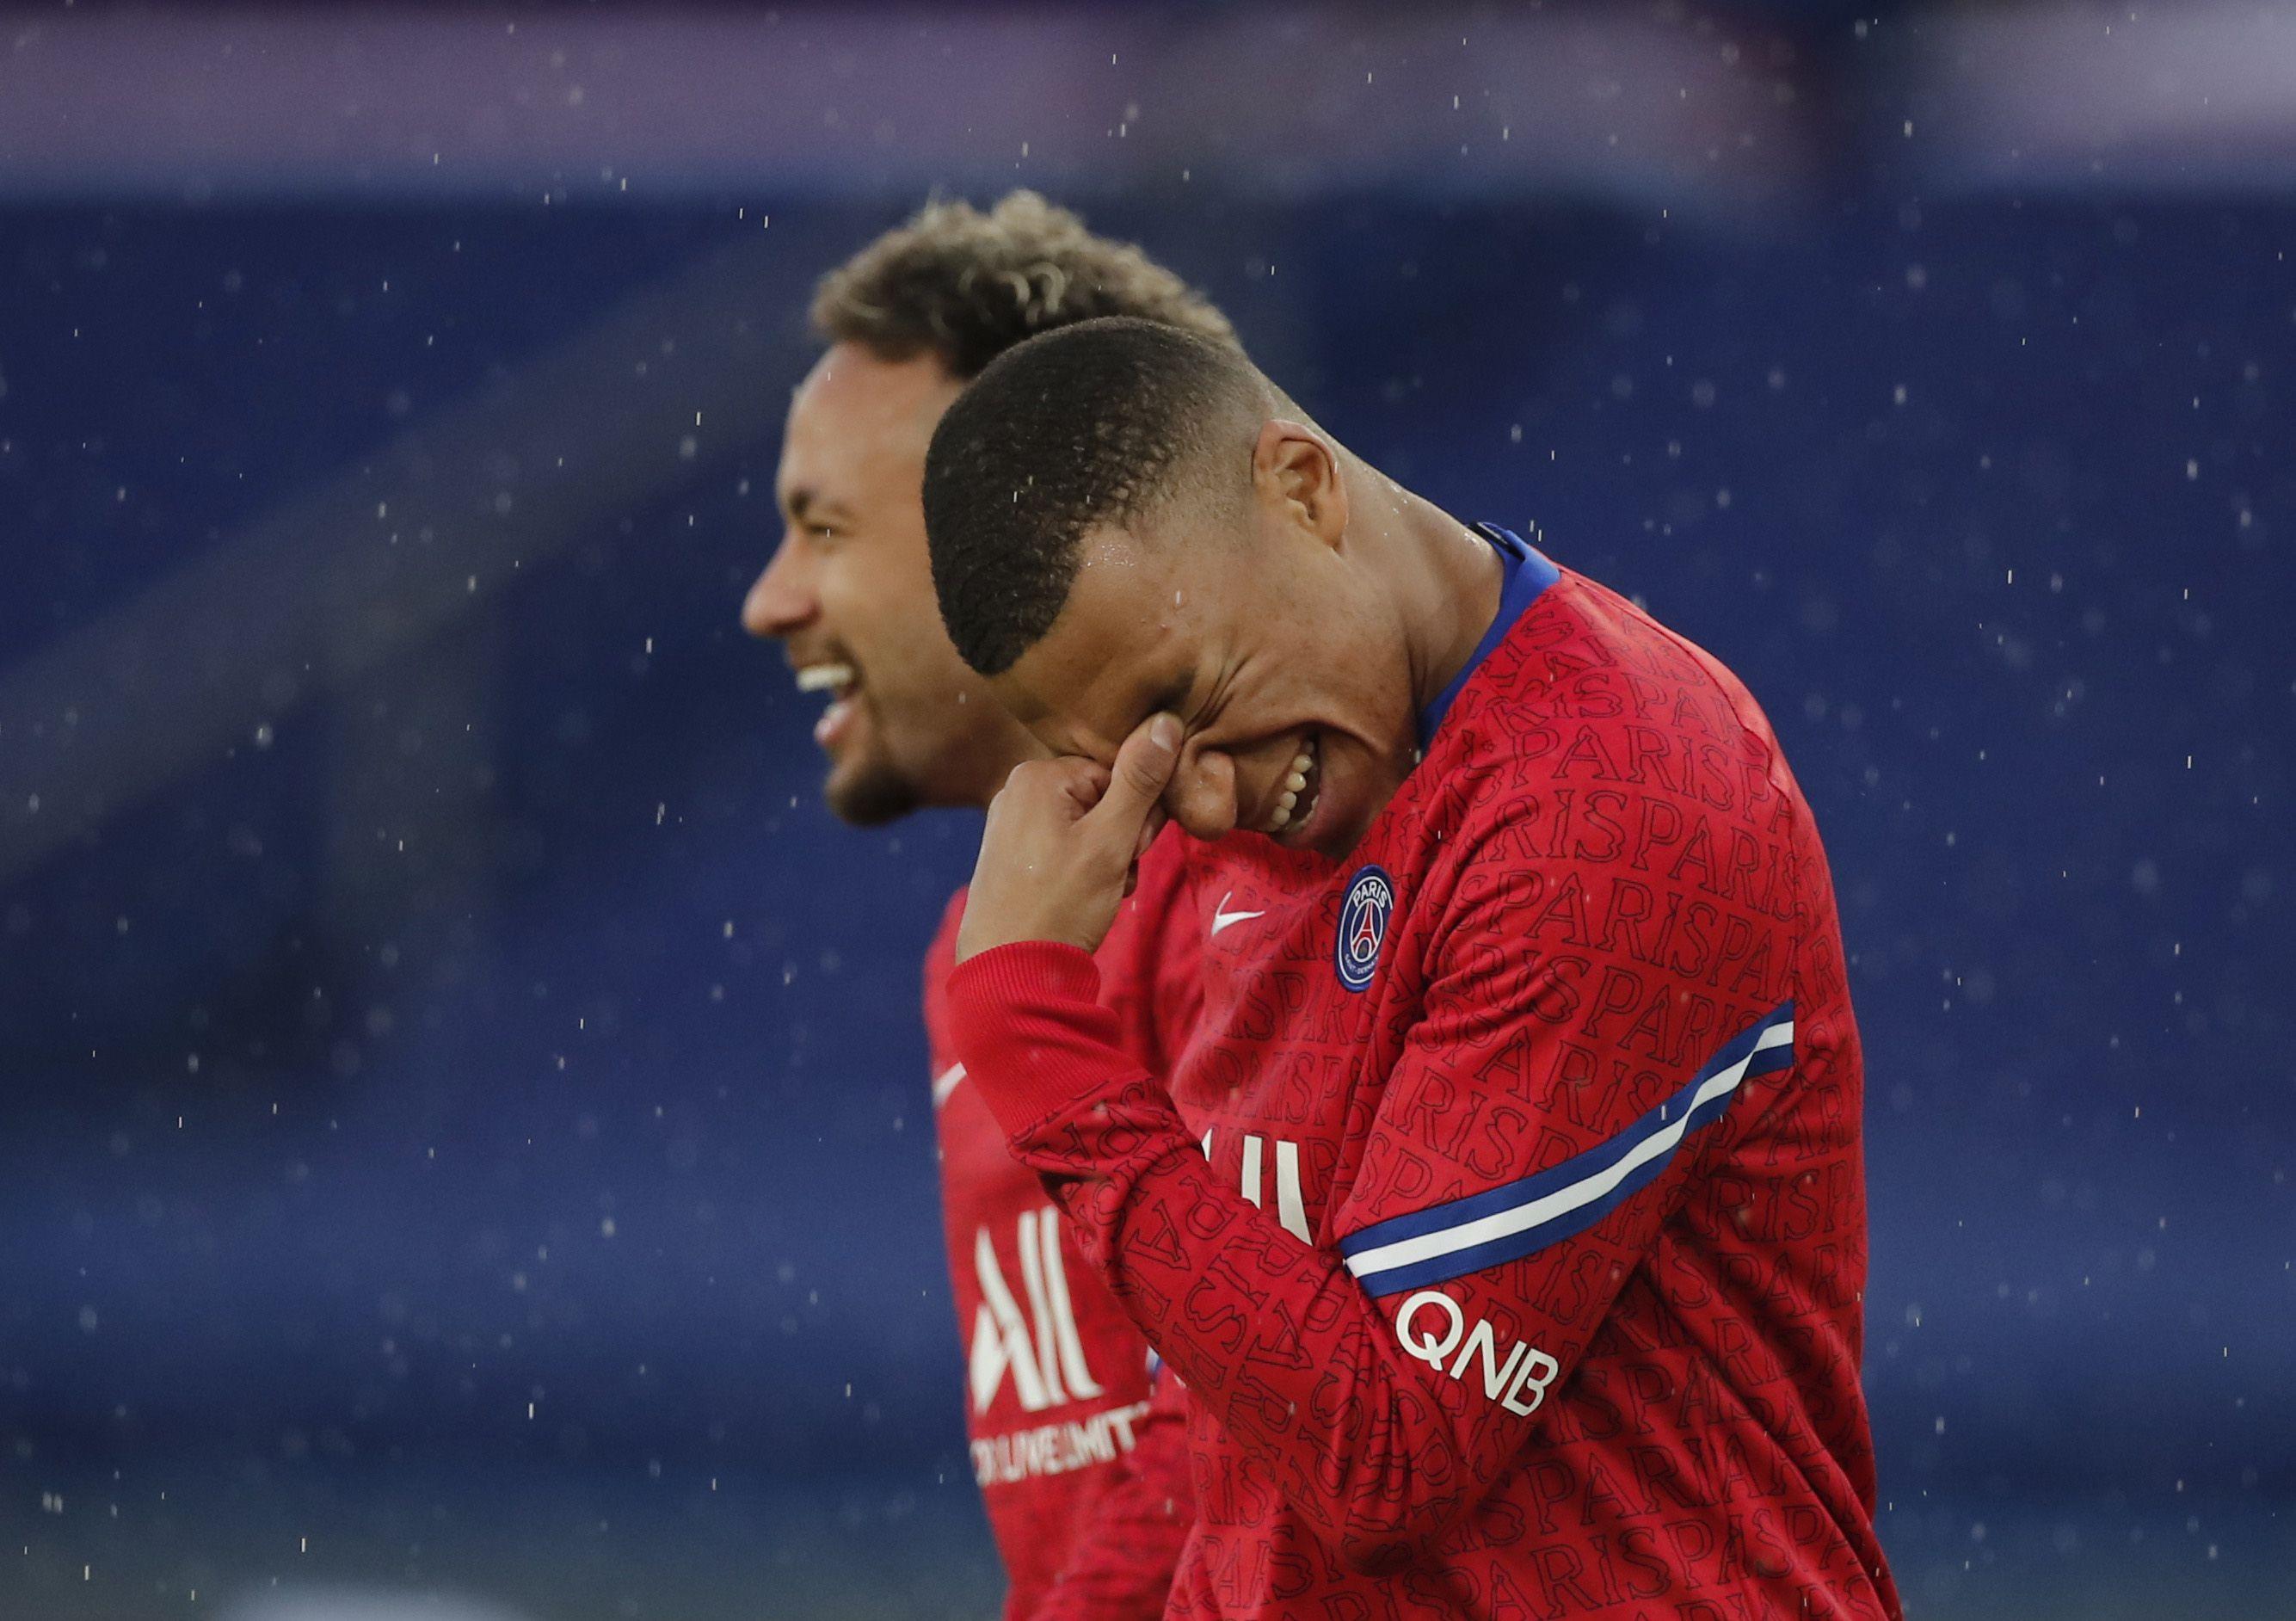 Neymar quiere a Mbappé para volver a pelear por ganar la Champions League (Reuters)